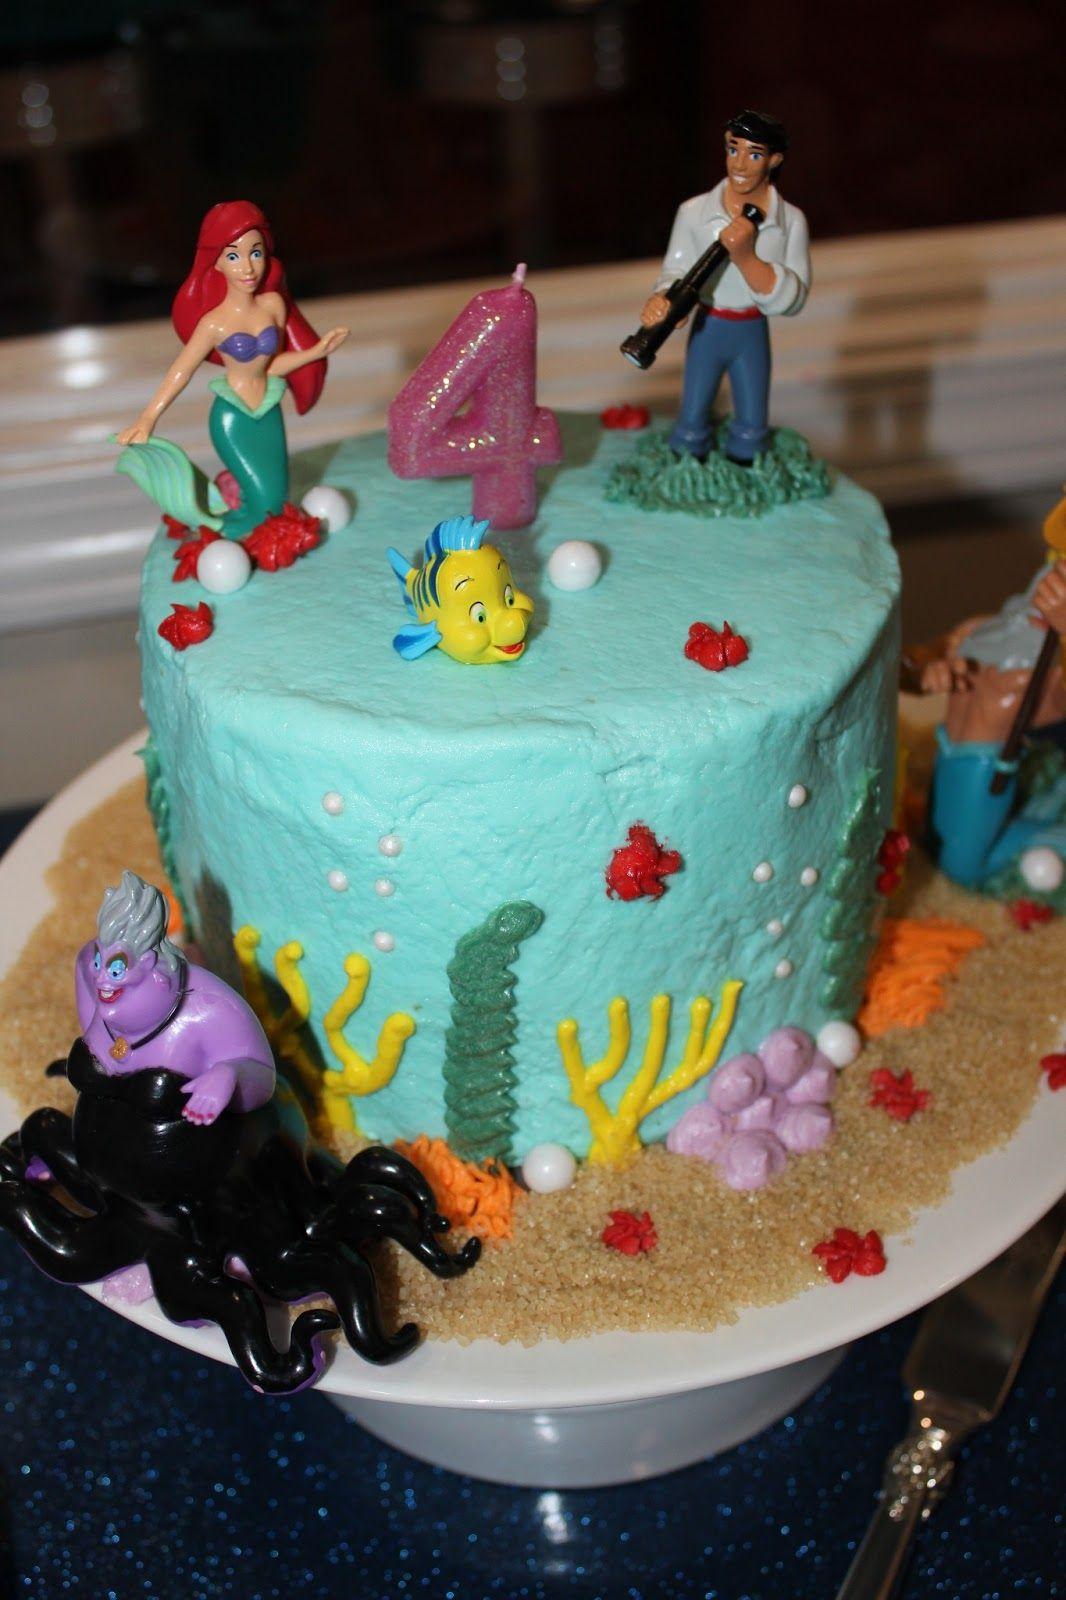 Fantastic Birthday Cakes At Walmart The Cake Boutique Personalised Birthday Cards Veneteletsinfo